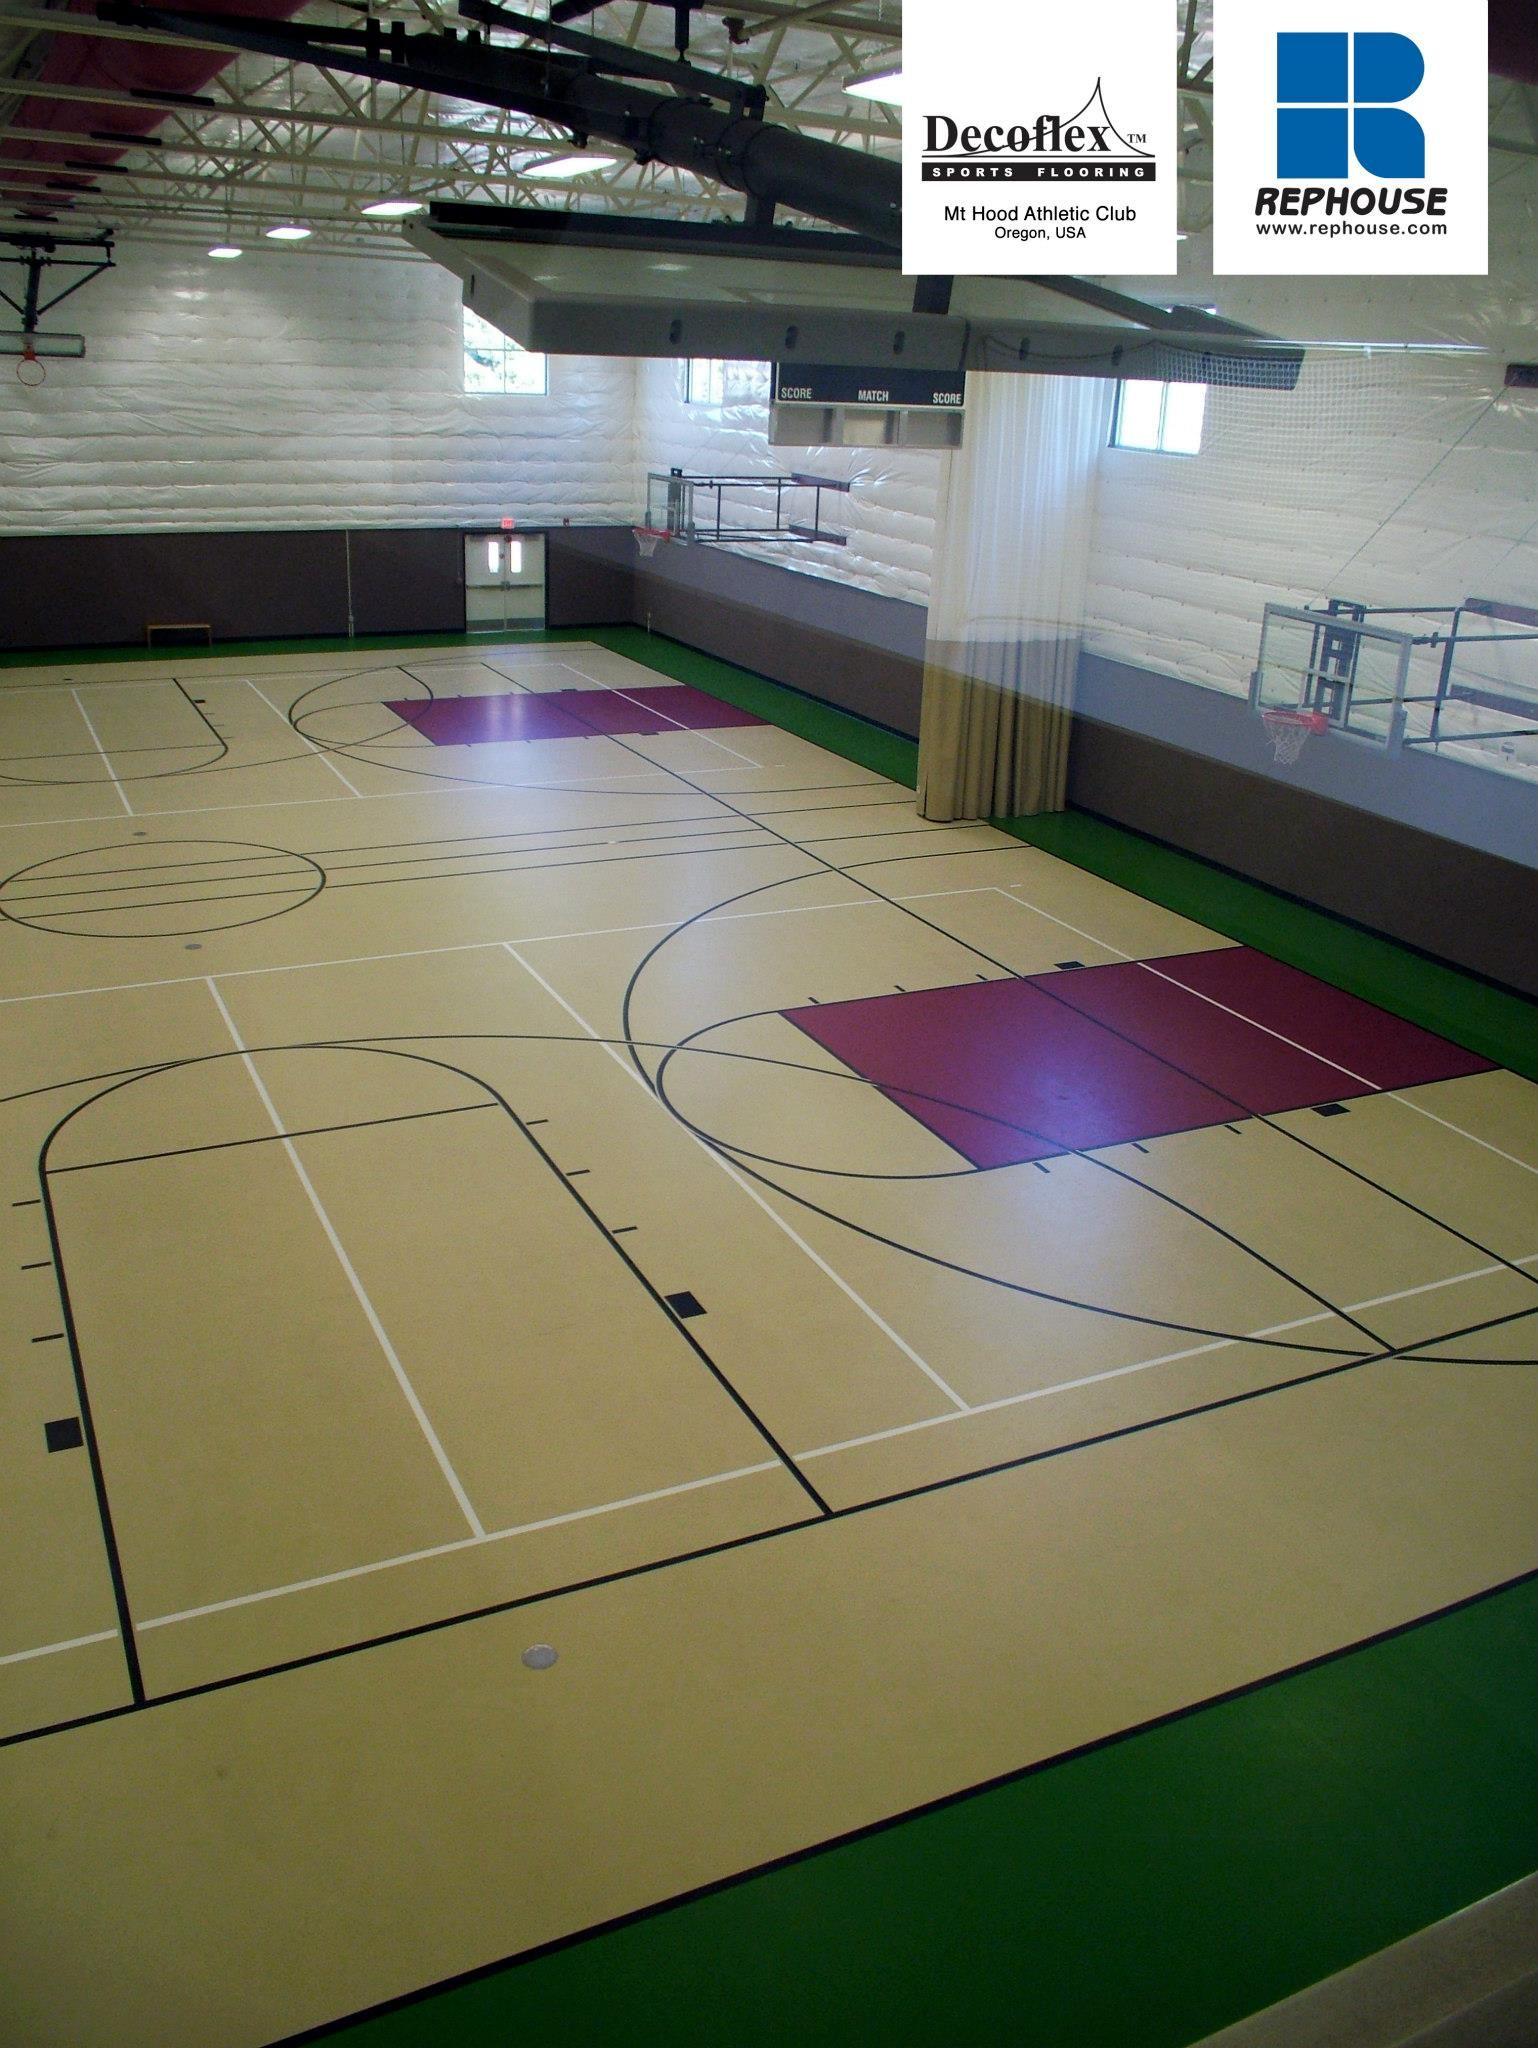 Decoflex Universal Seamless Polyurethane Indoor Sports Flooring Mt Hood Athletic Club Oregon Usa Indoor Sports Gym Flooring Rubber Gym Flooring